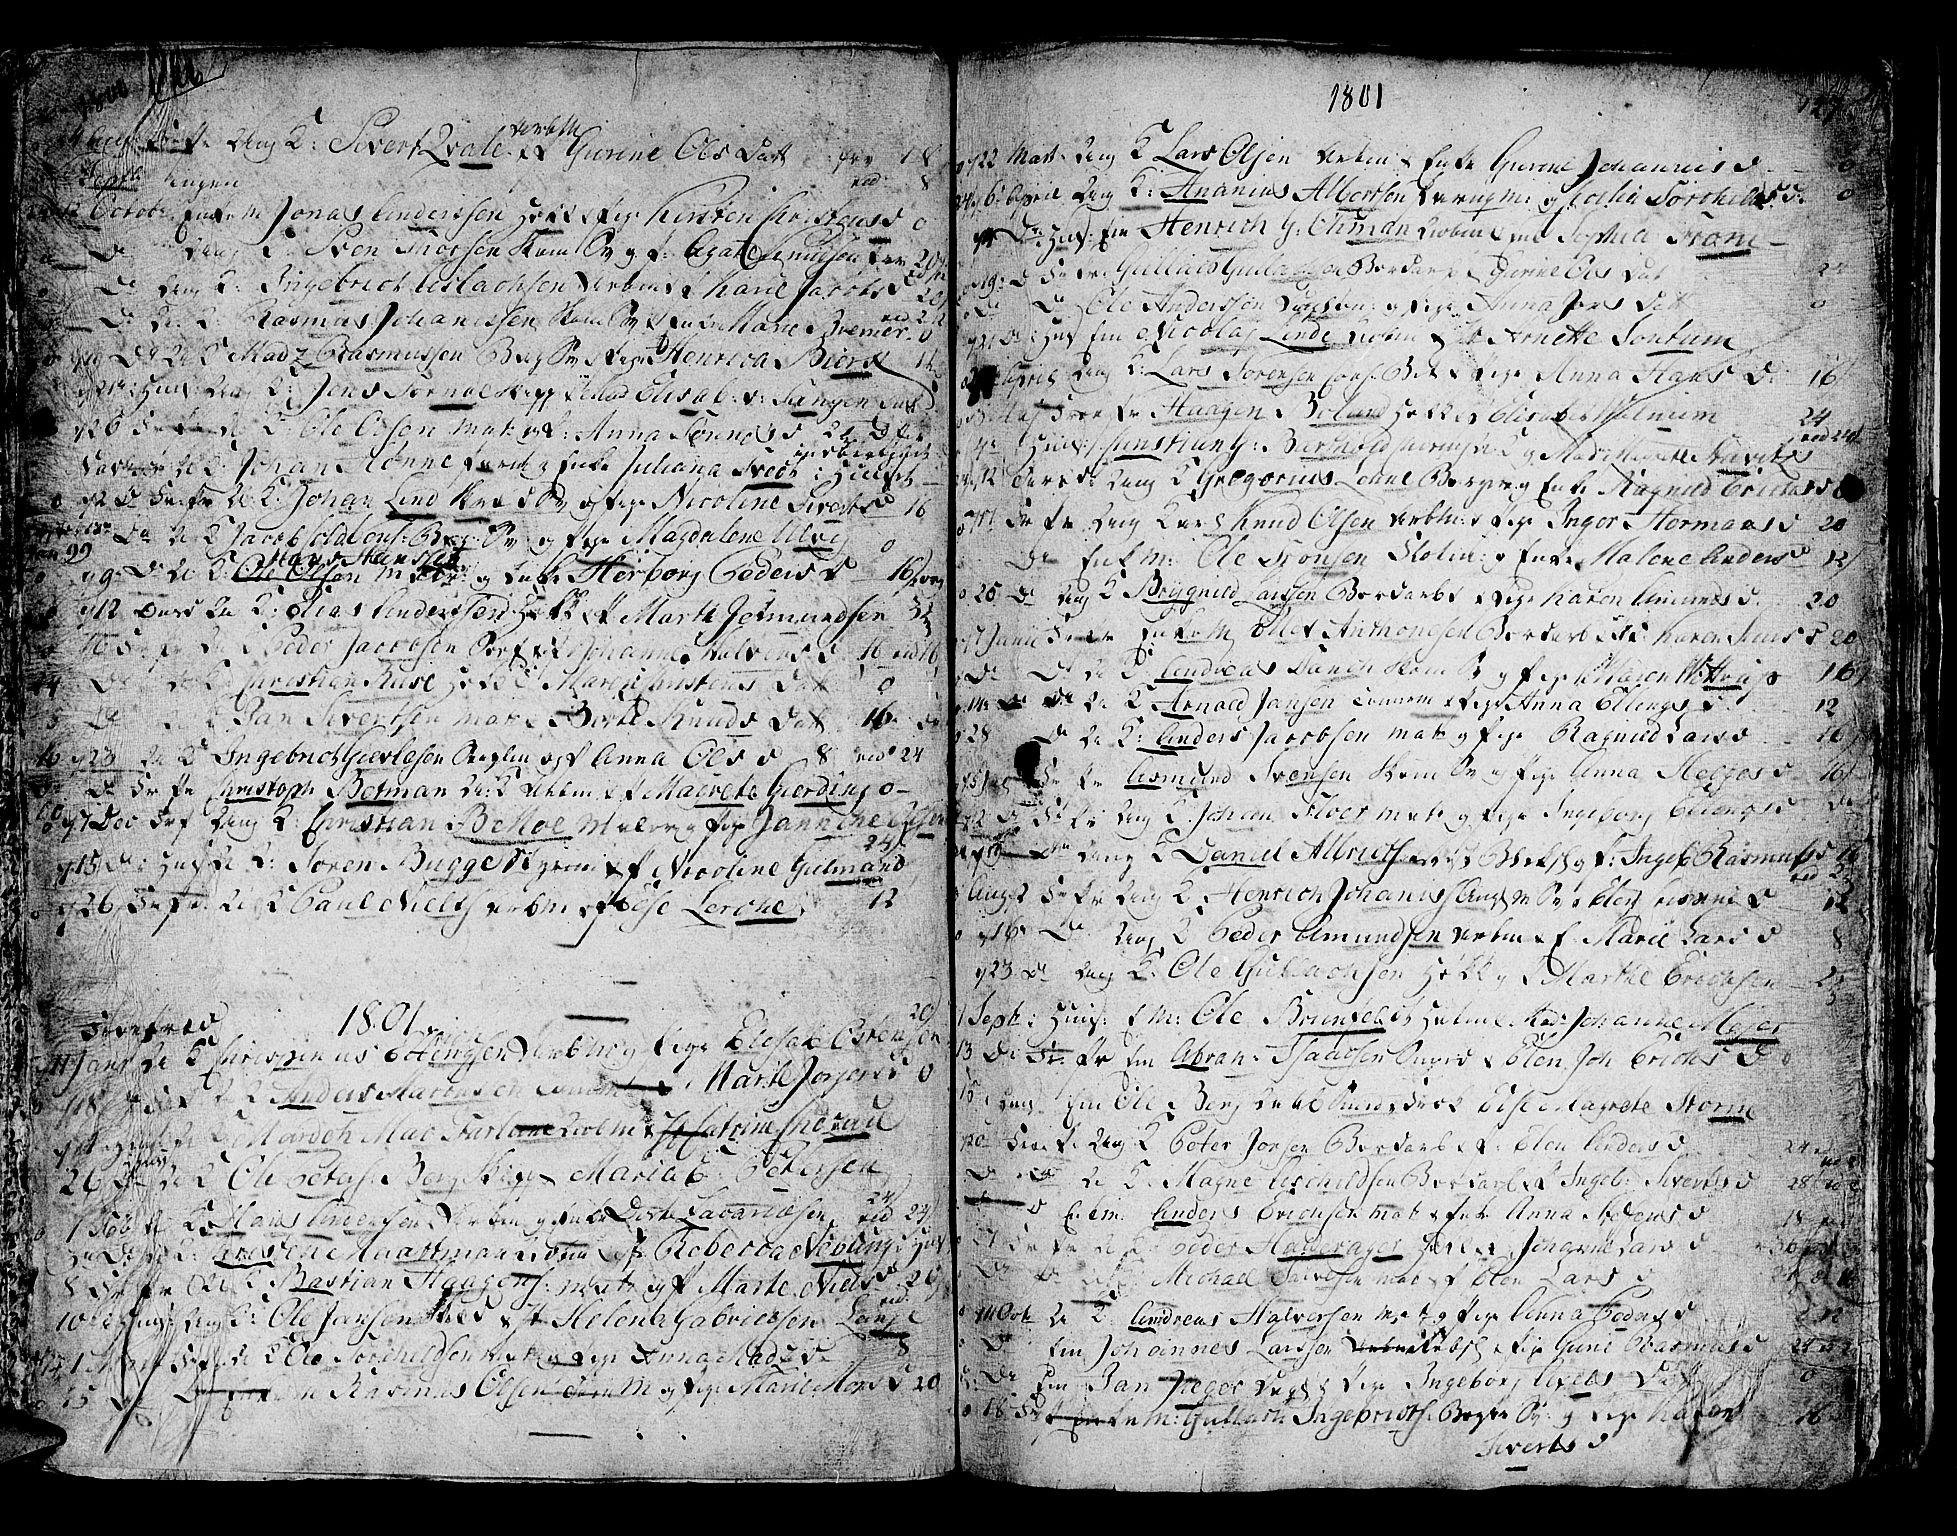 SAB, Domkirken Sokneprestembete, H/Haa/L0007: Ministerialbok nr. A 7, 1725-1826, s. 126-127